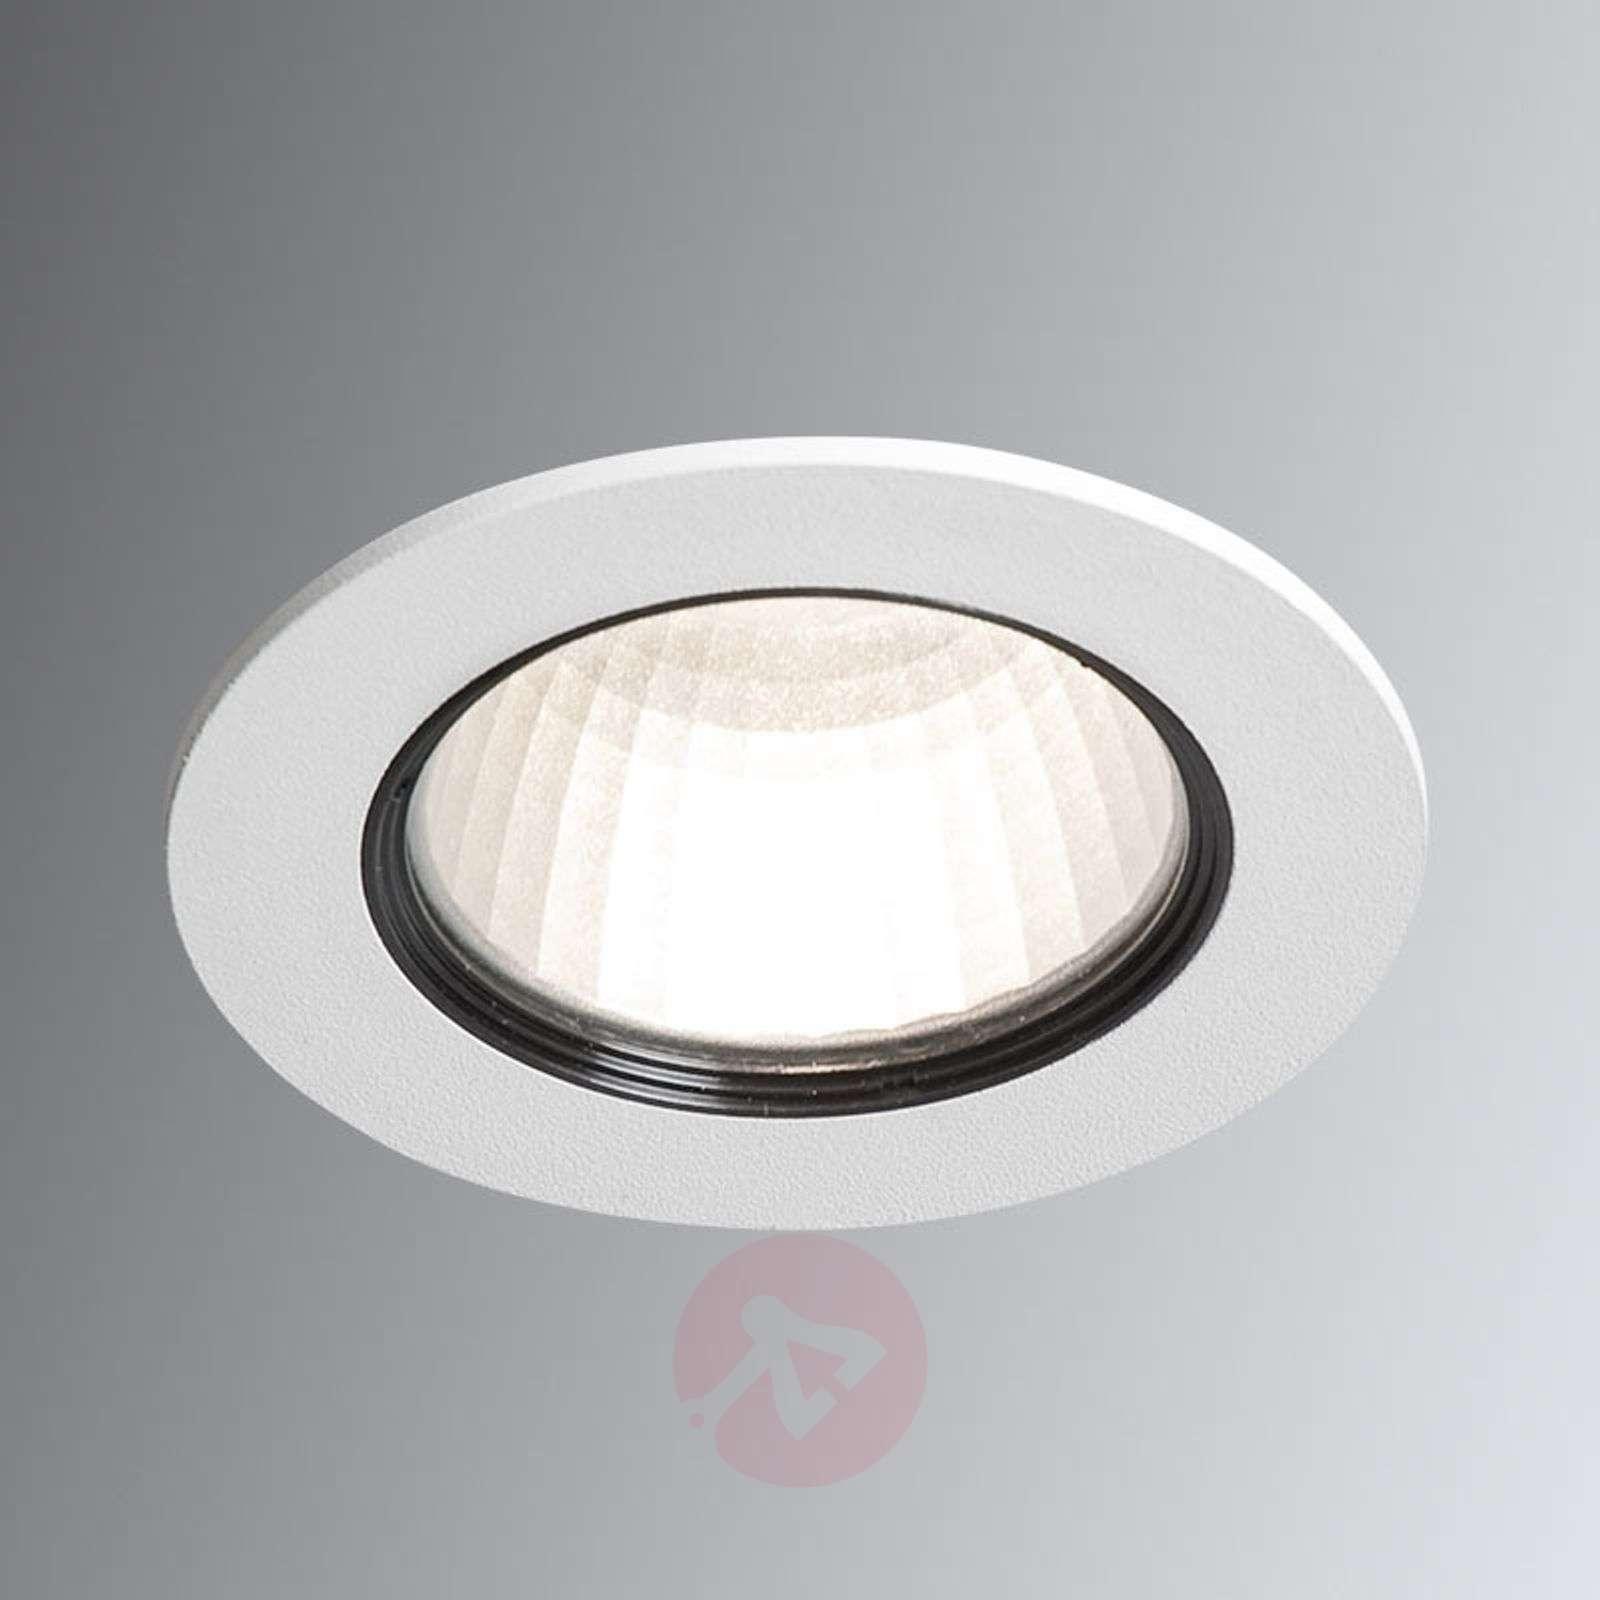 LED-uppospotti Sunray I 9W, 3000K-6523746-01